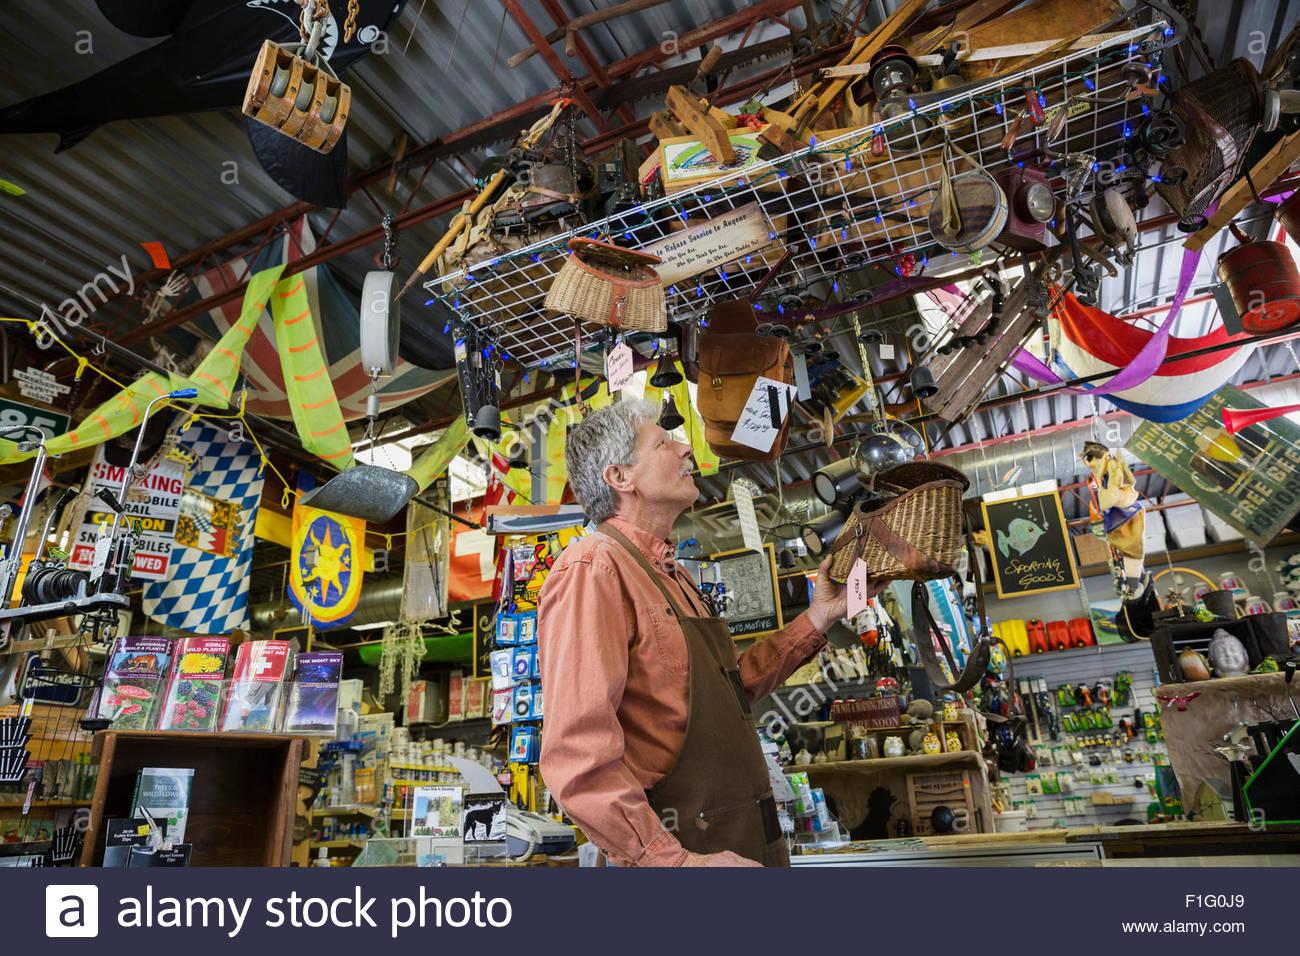 Hardware store owner checking hanging display of fishing baskets - Stock Image